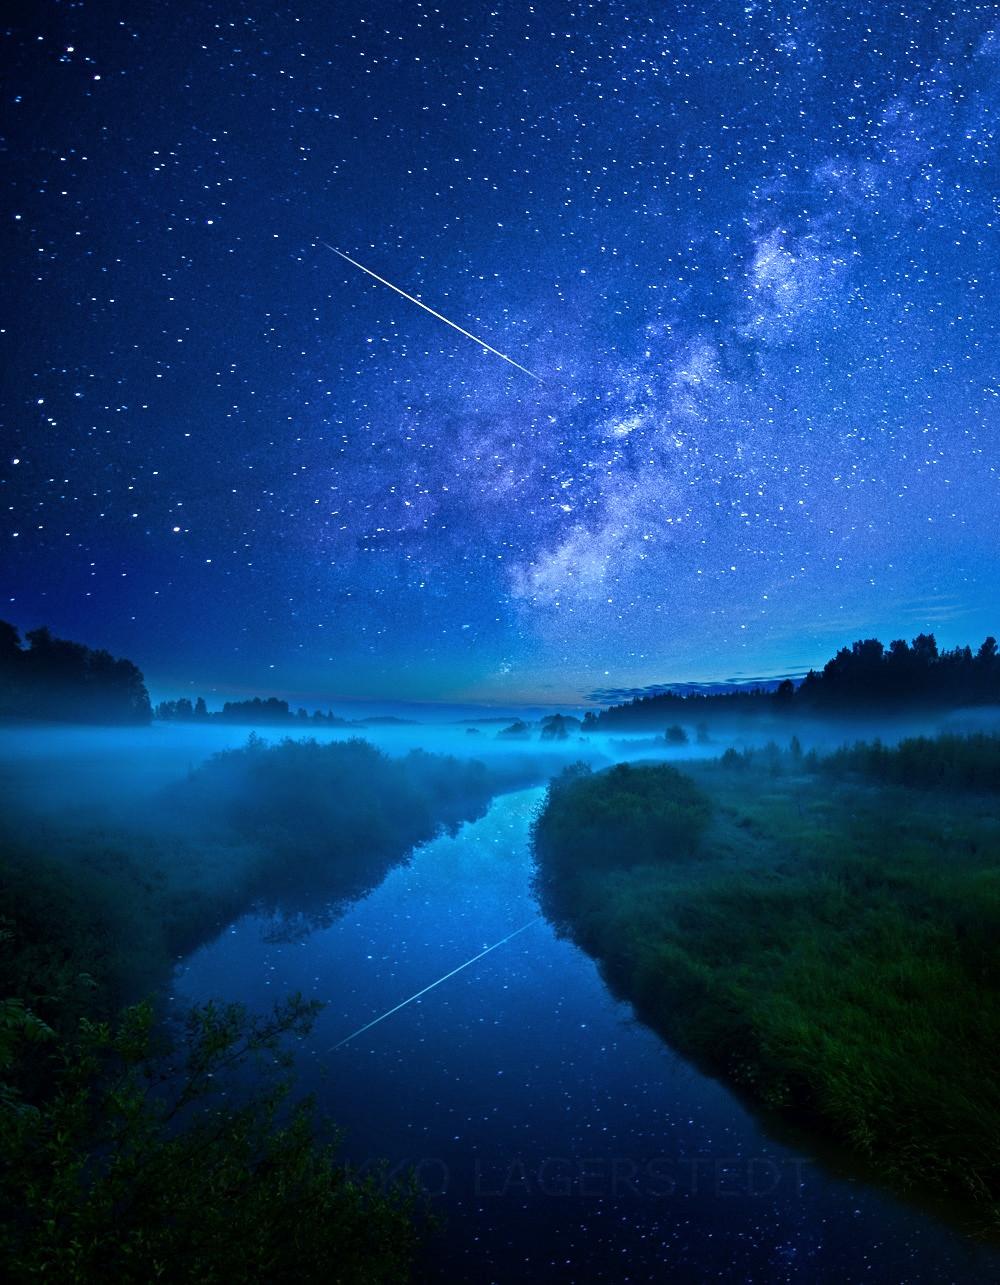 """Night River"" By Mikko Lagerstedt."